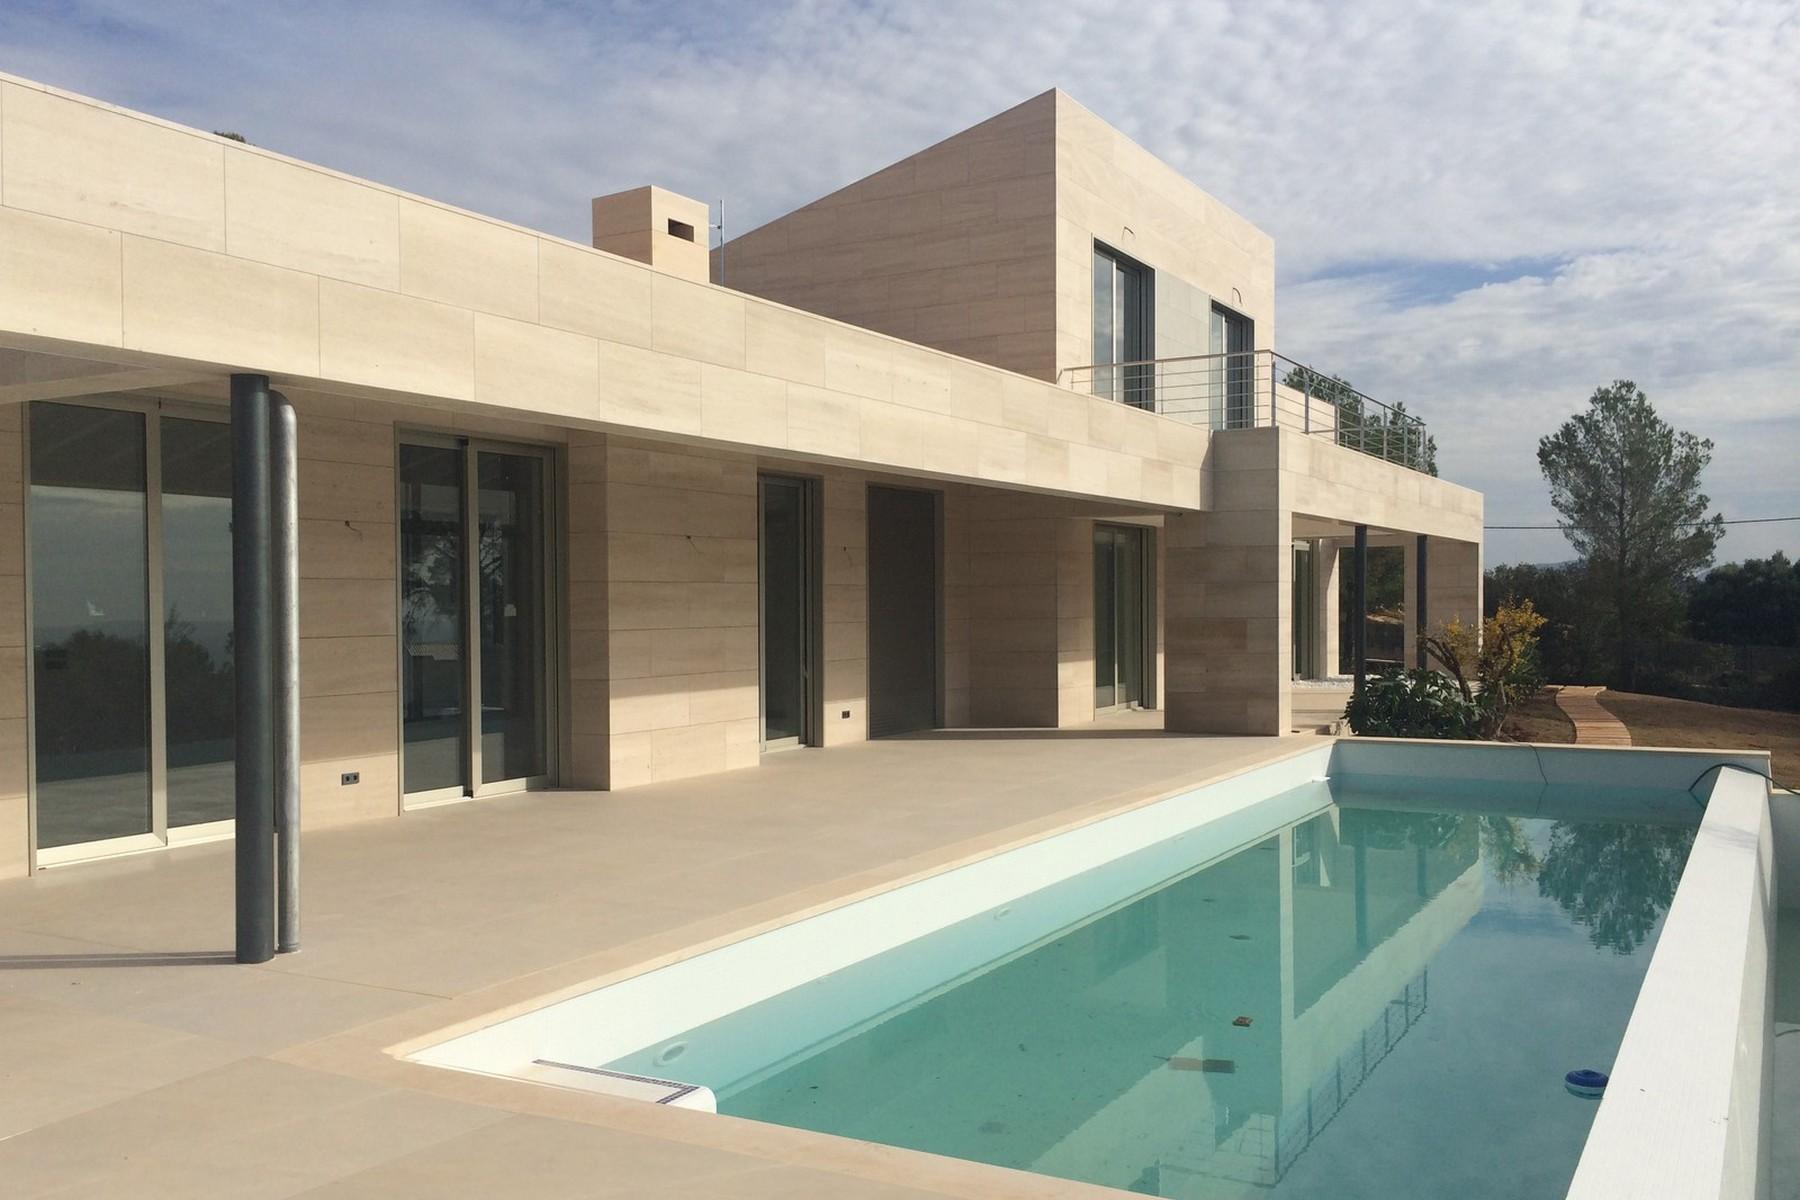 獨棟家庭住宅 為 出售 在 Unique newly built villa Other Balearic Islands, Balearic Islands 07004 西班牙